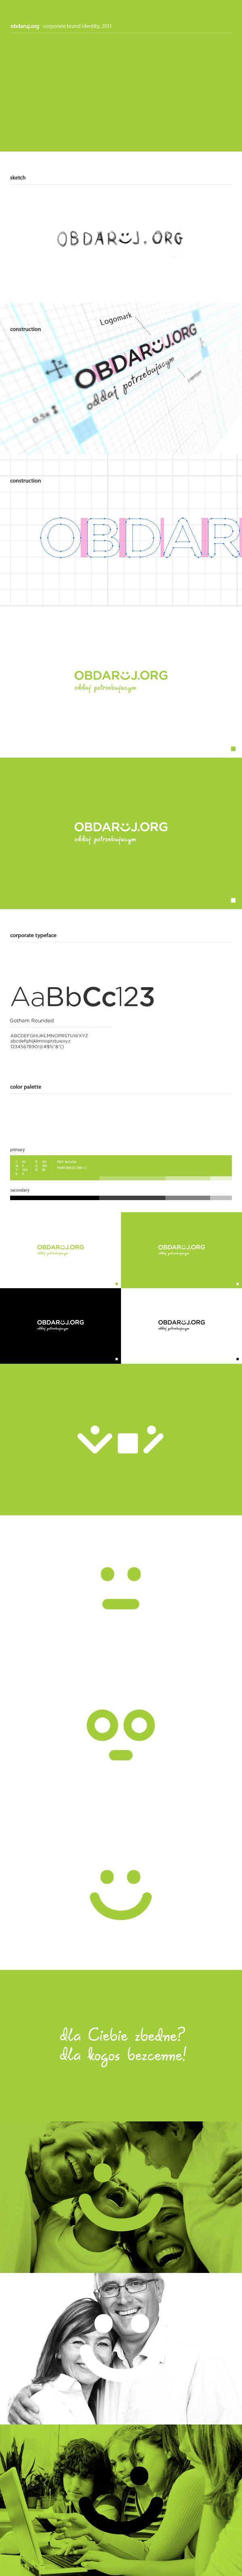 Logo designing for obdaruj.org